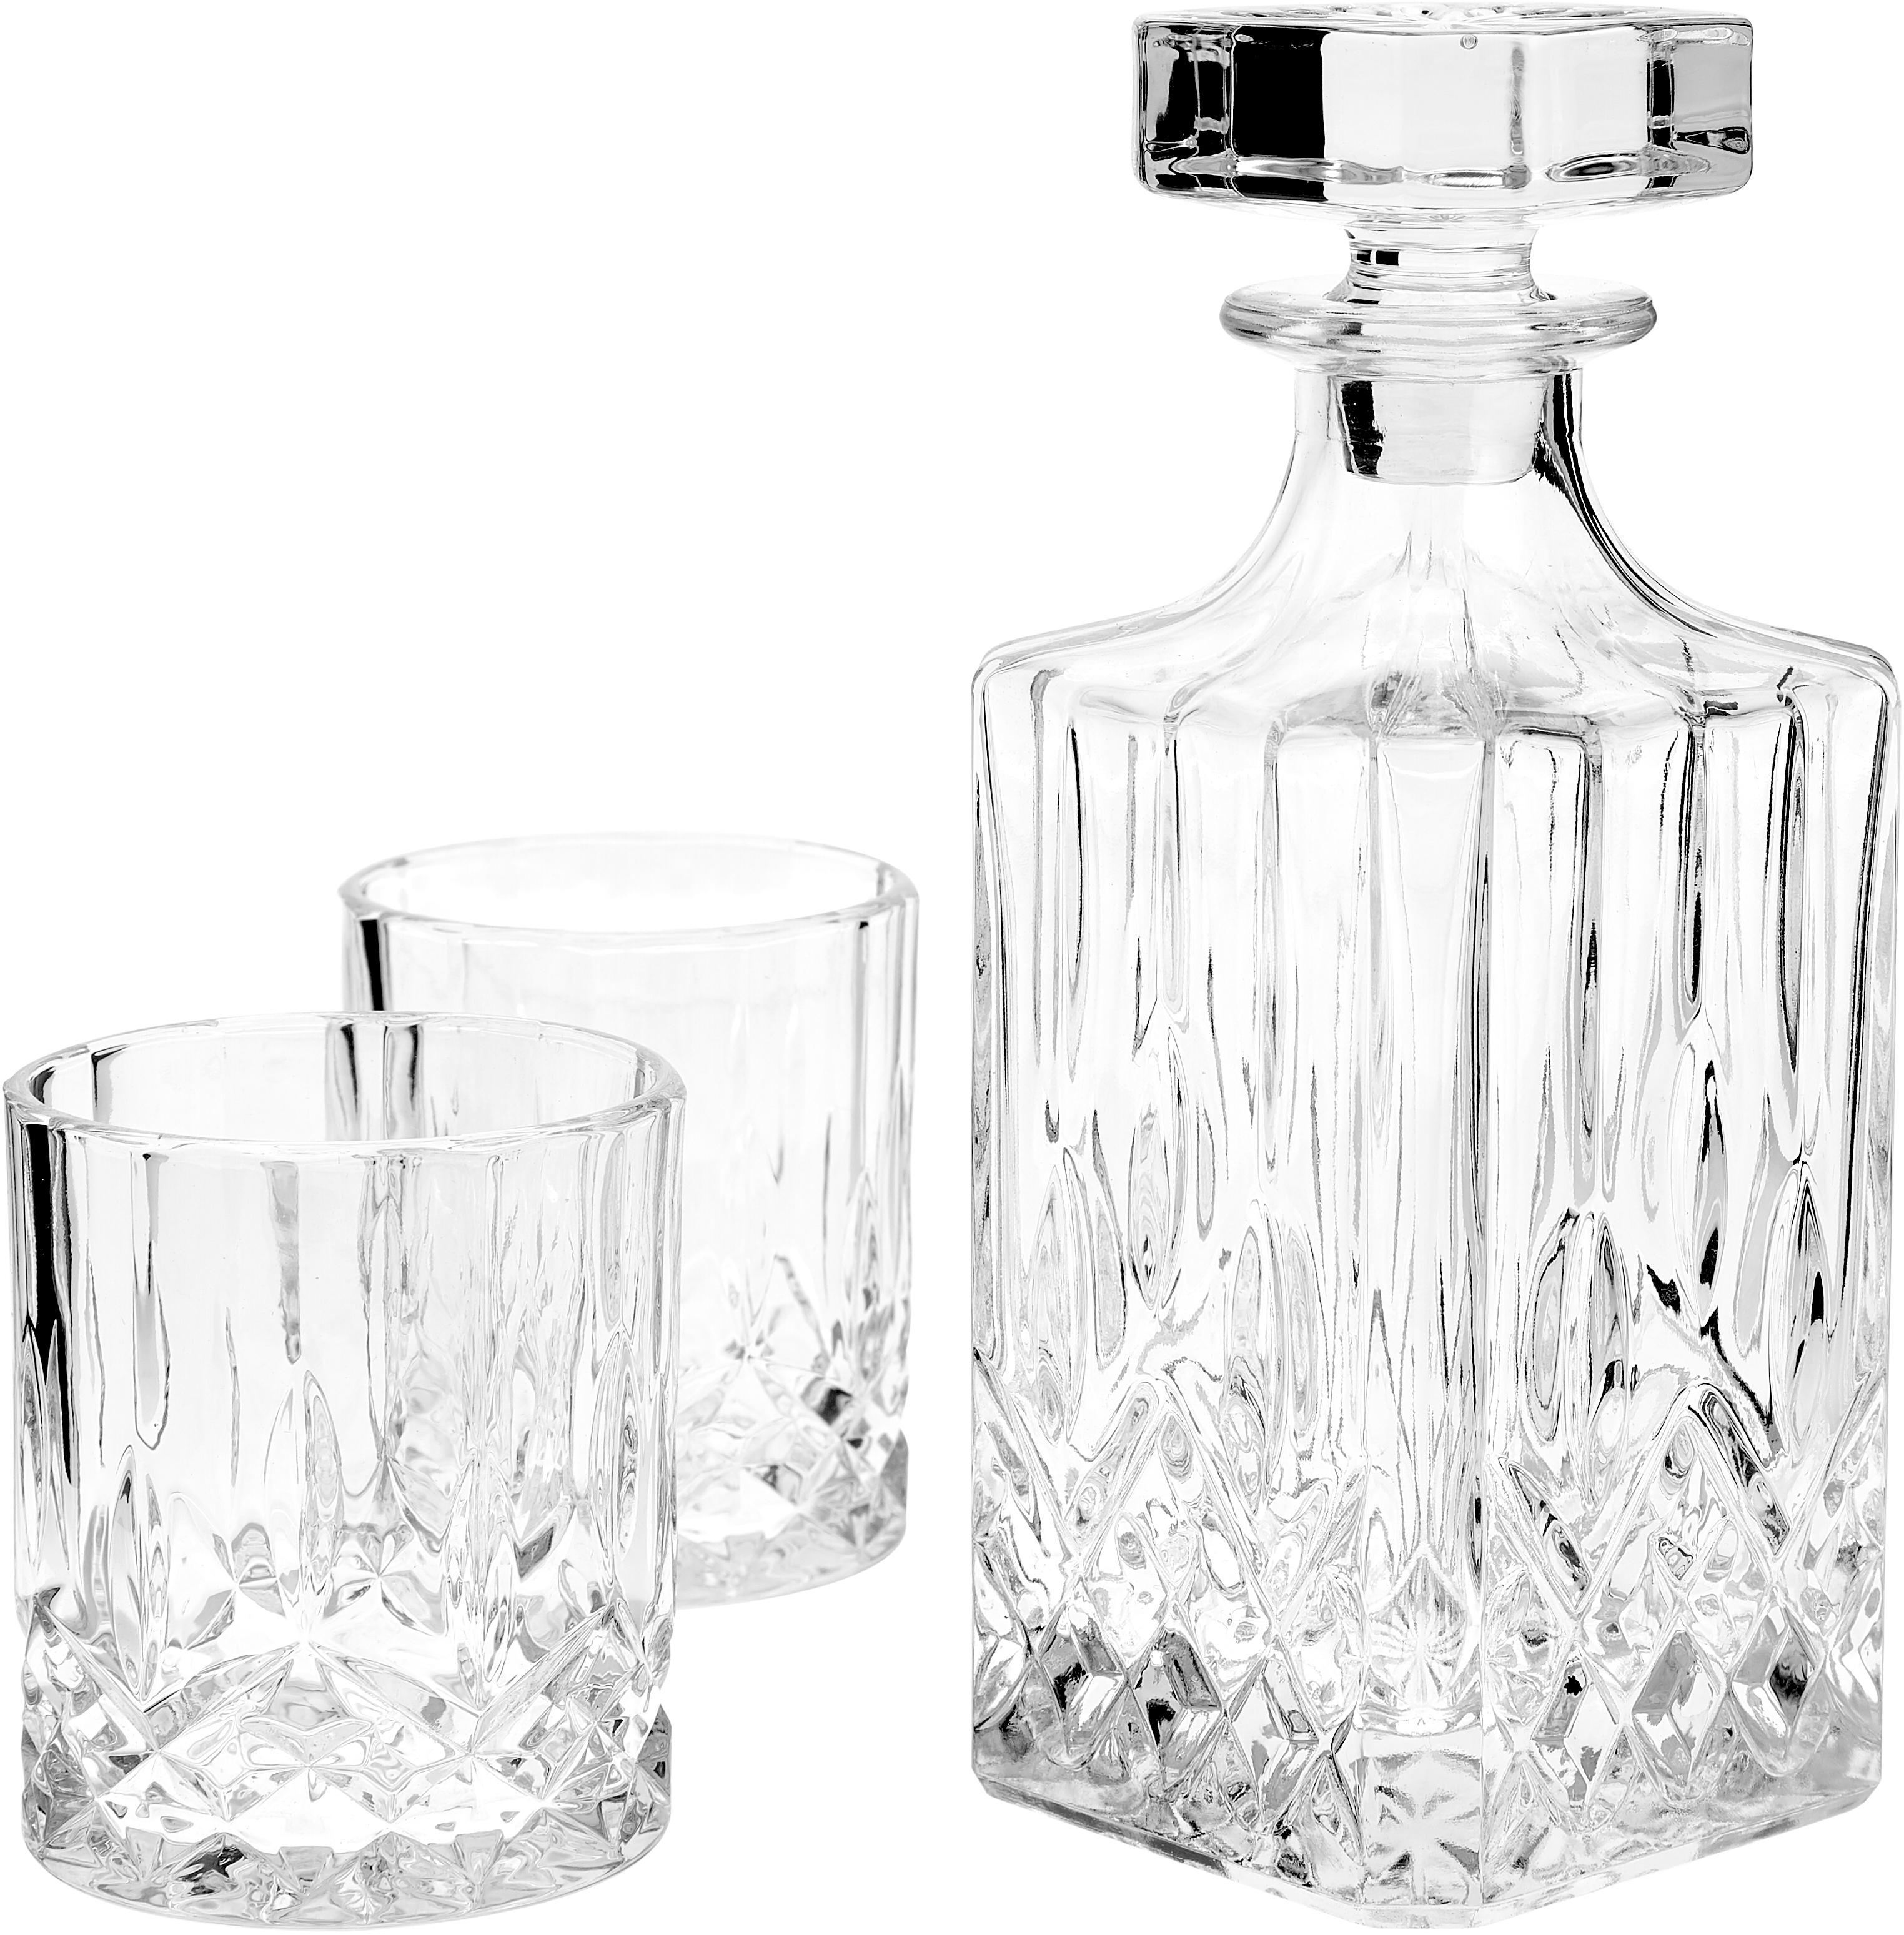 Set da whisky George 3 pz, Vetro, Trasparente, Set in varie misure